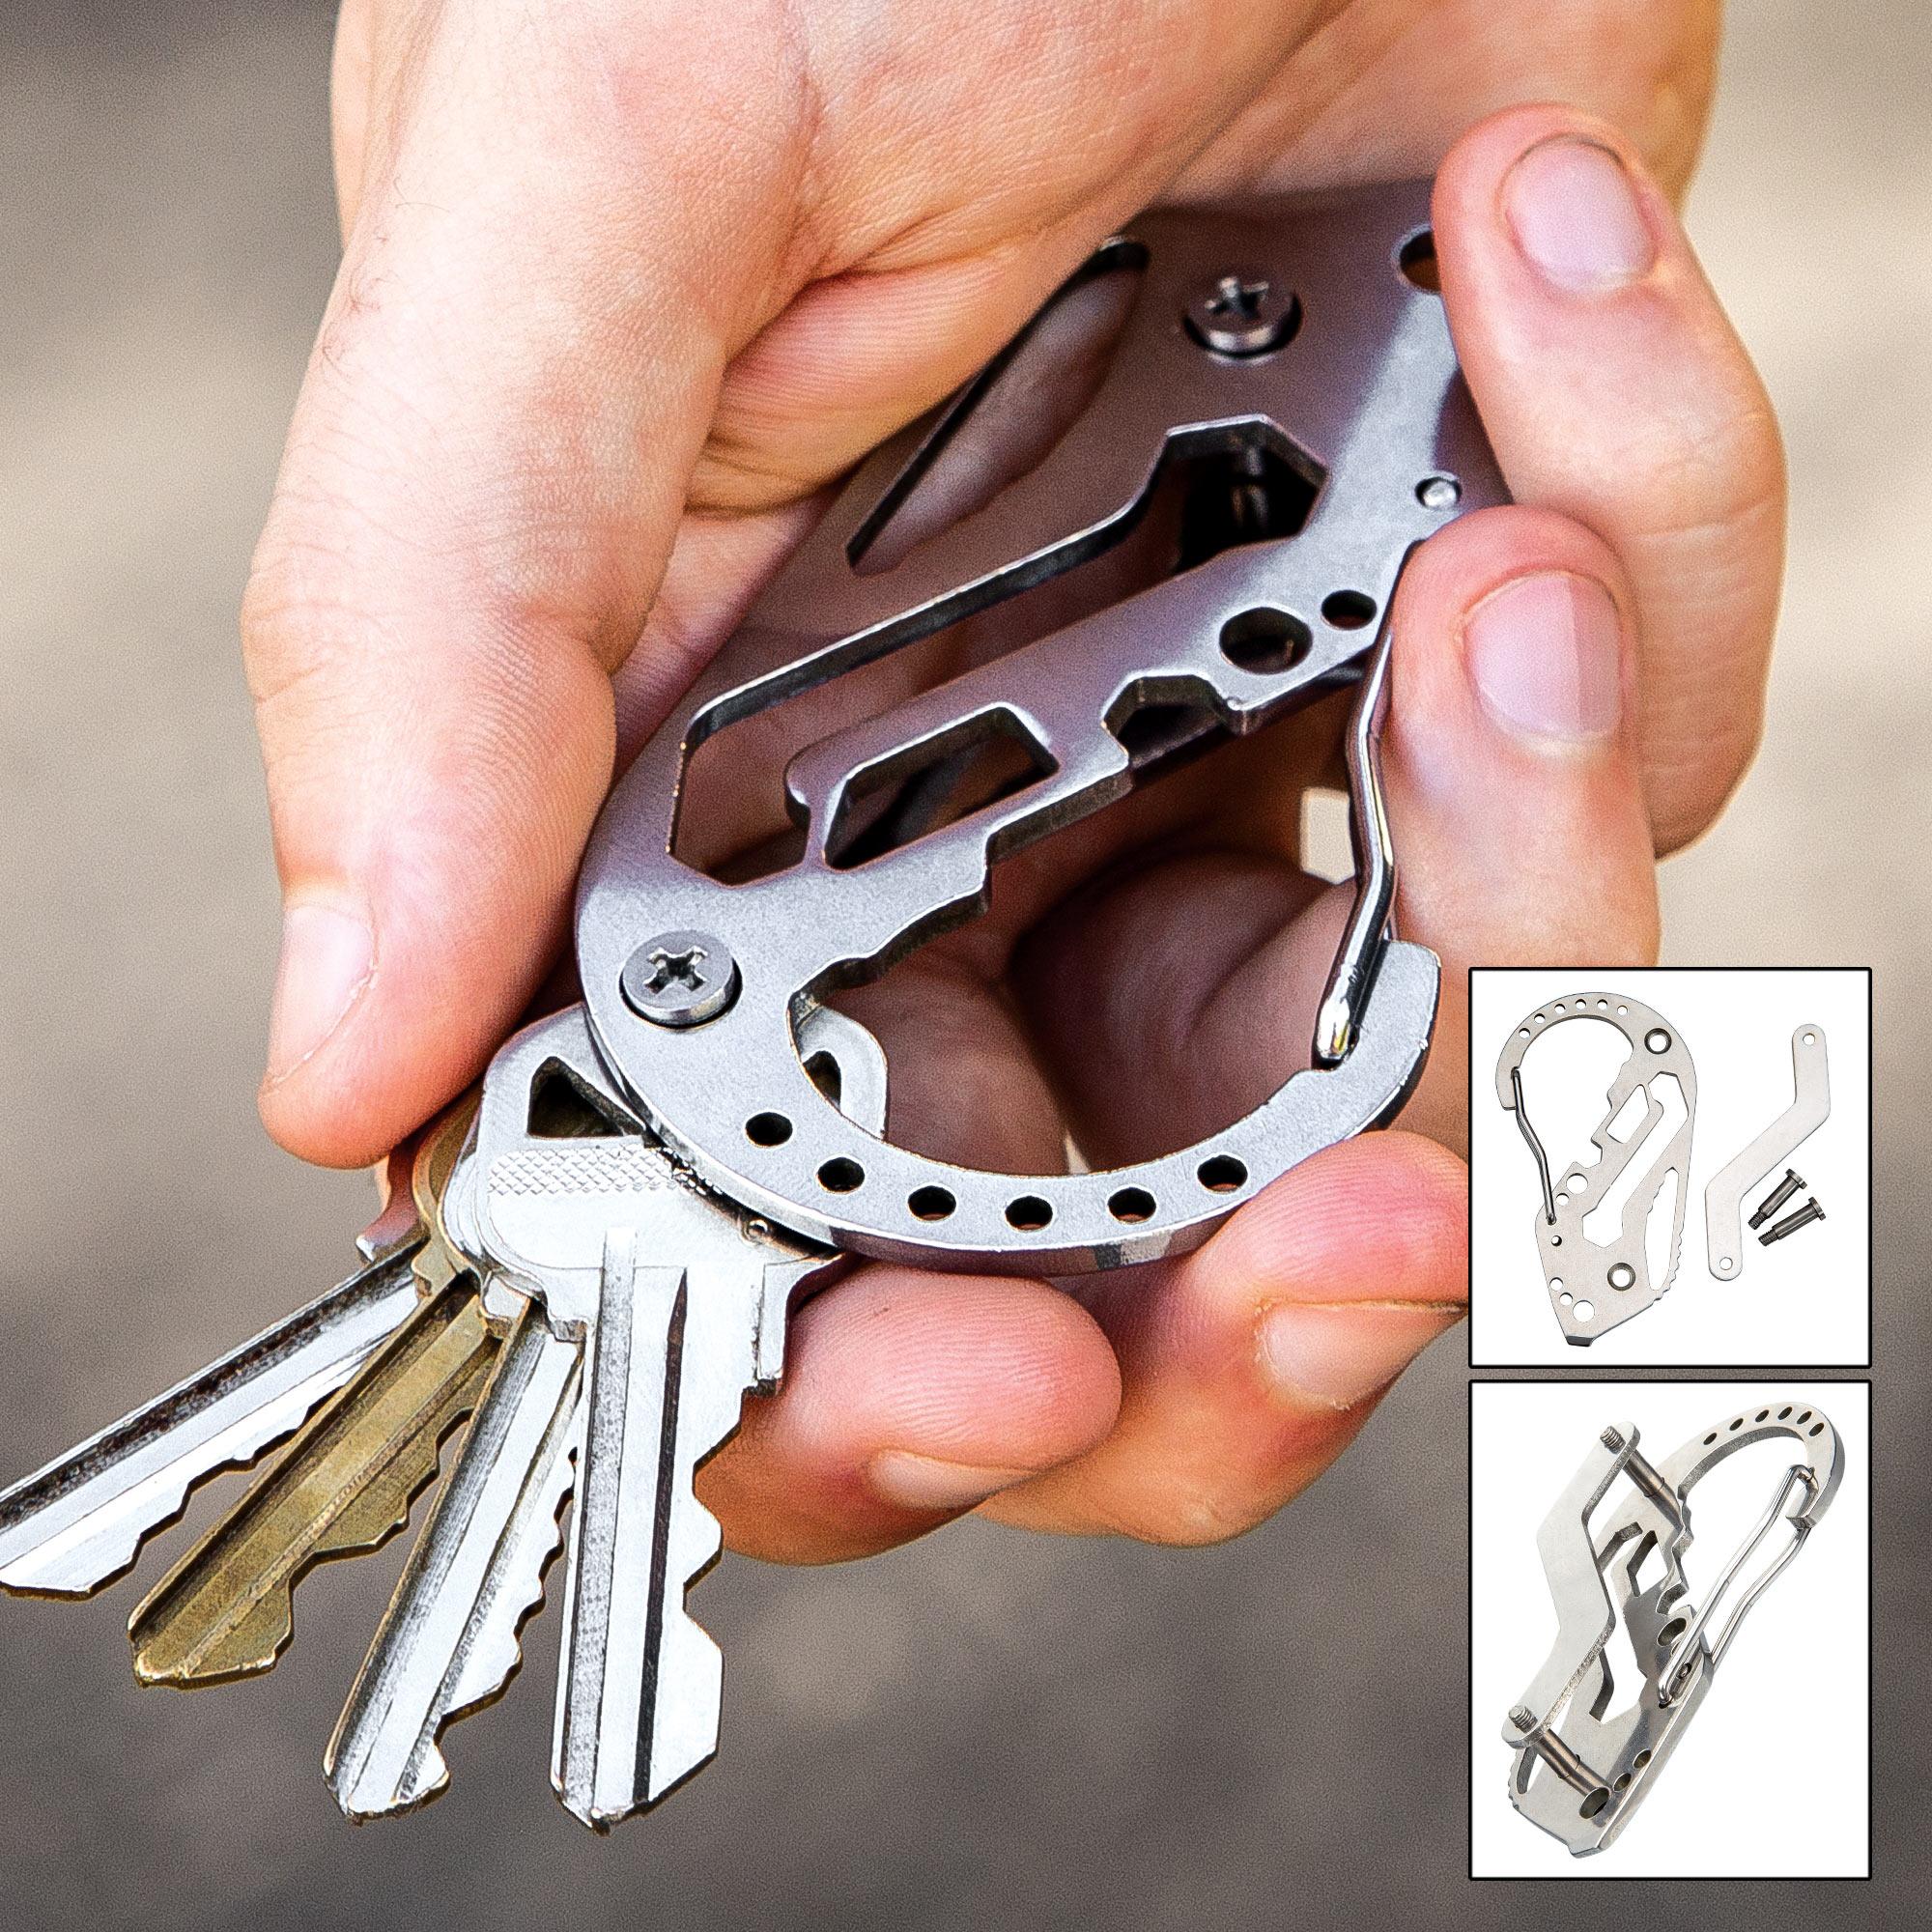 NEW Aluminum Smart Key Pocket Wallet Holder DIY Keychain EDC Multiple Keys 2020